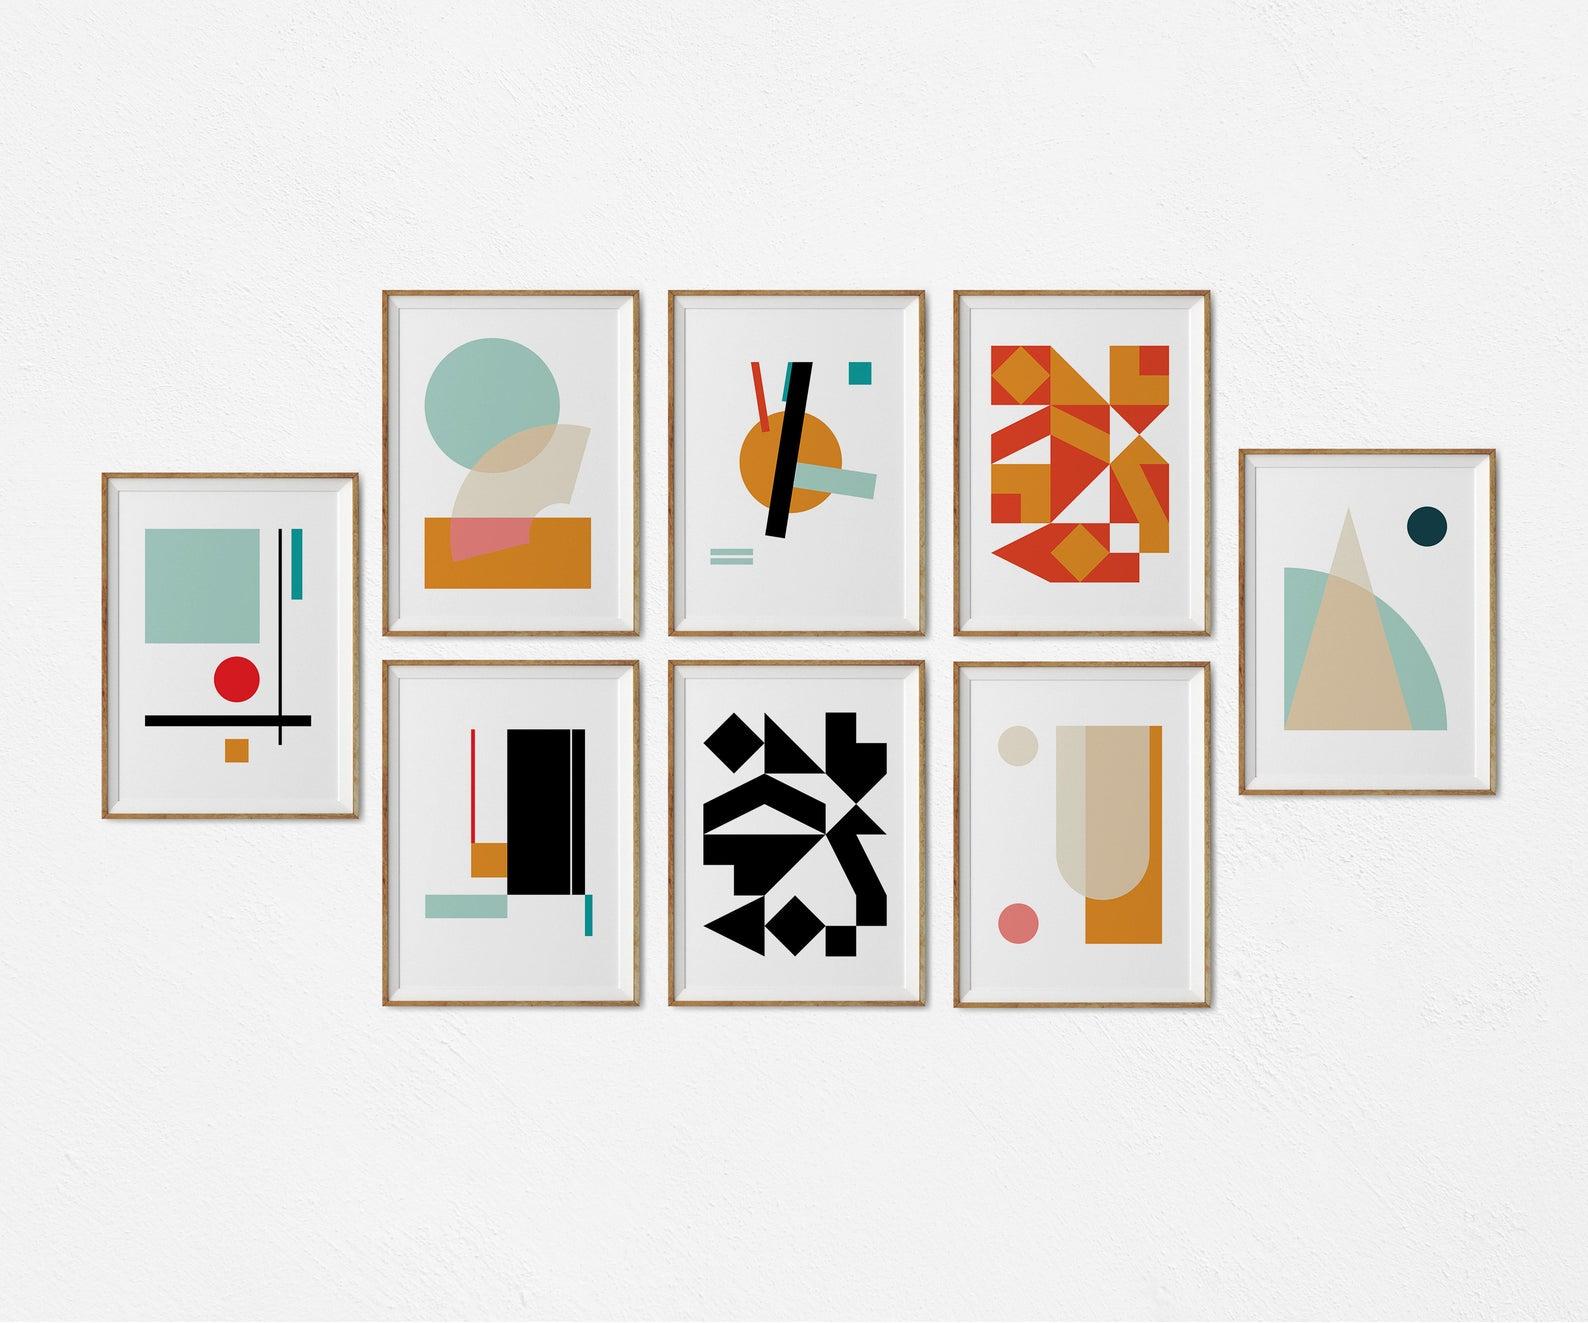 Láminas estilo Mondrian